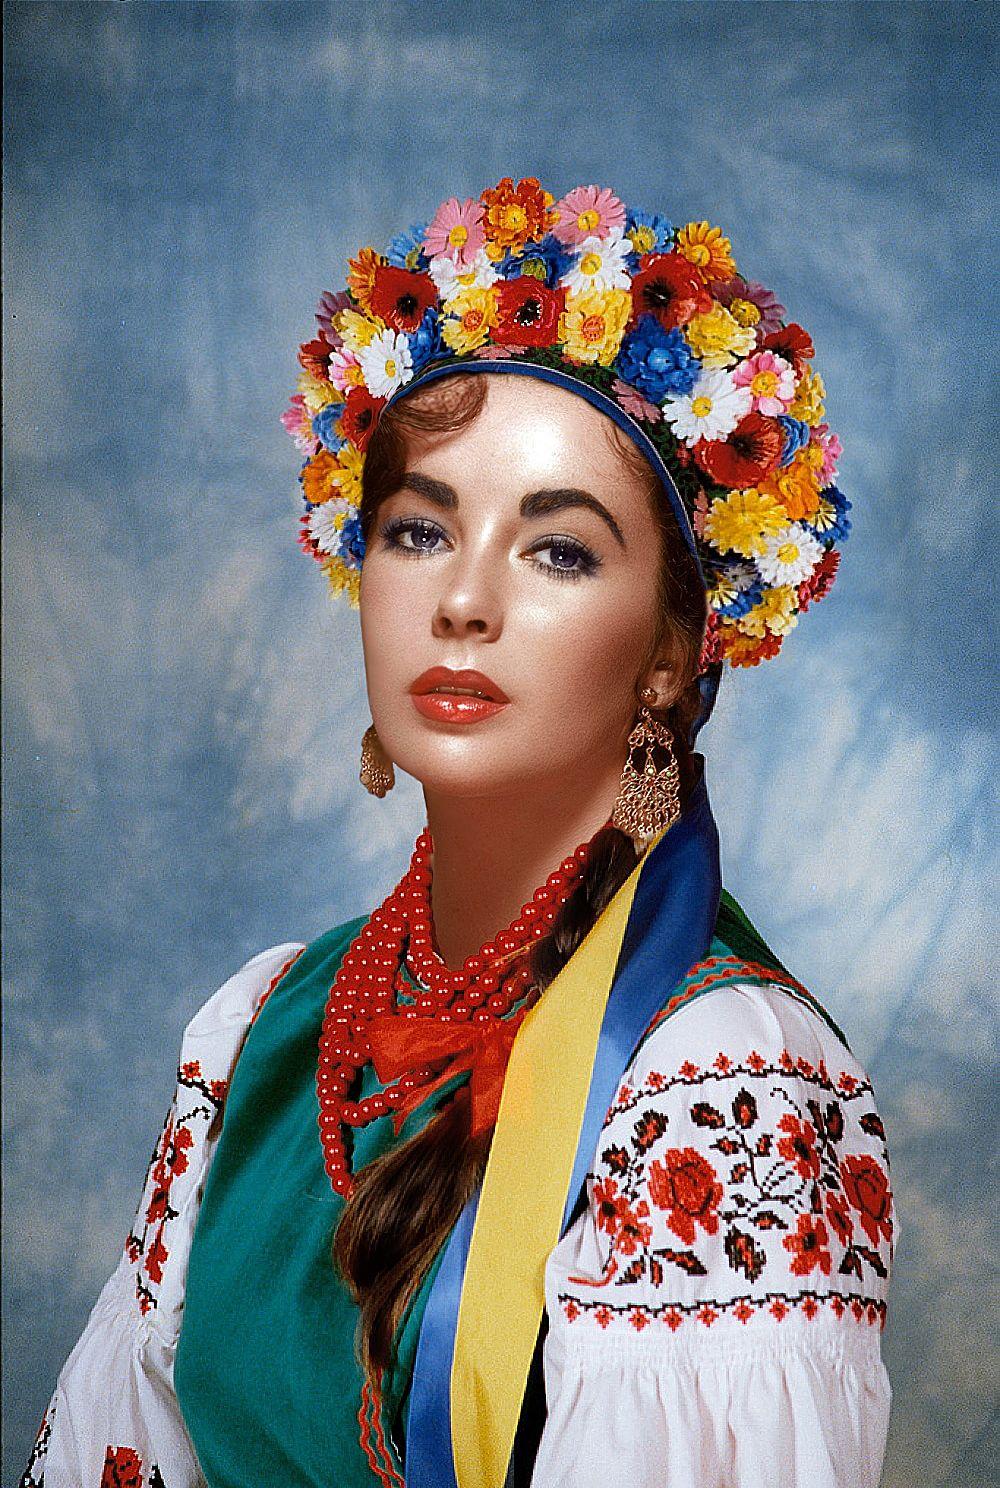 Femme ukraine connexion ukraine connexion